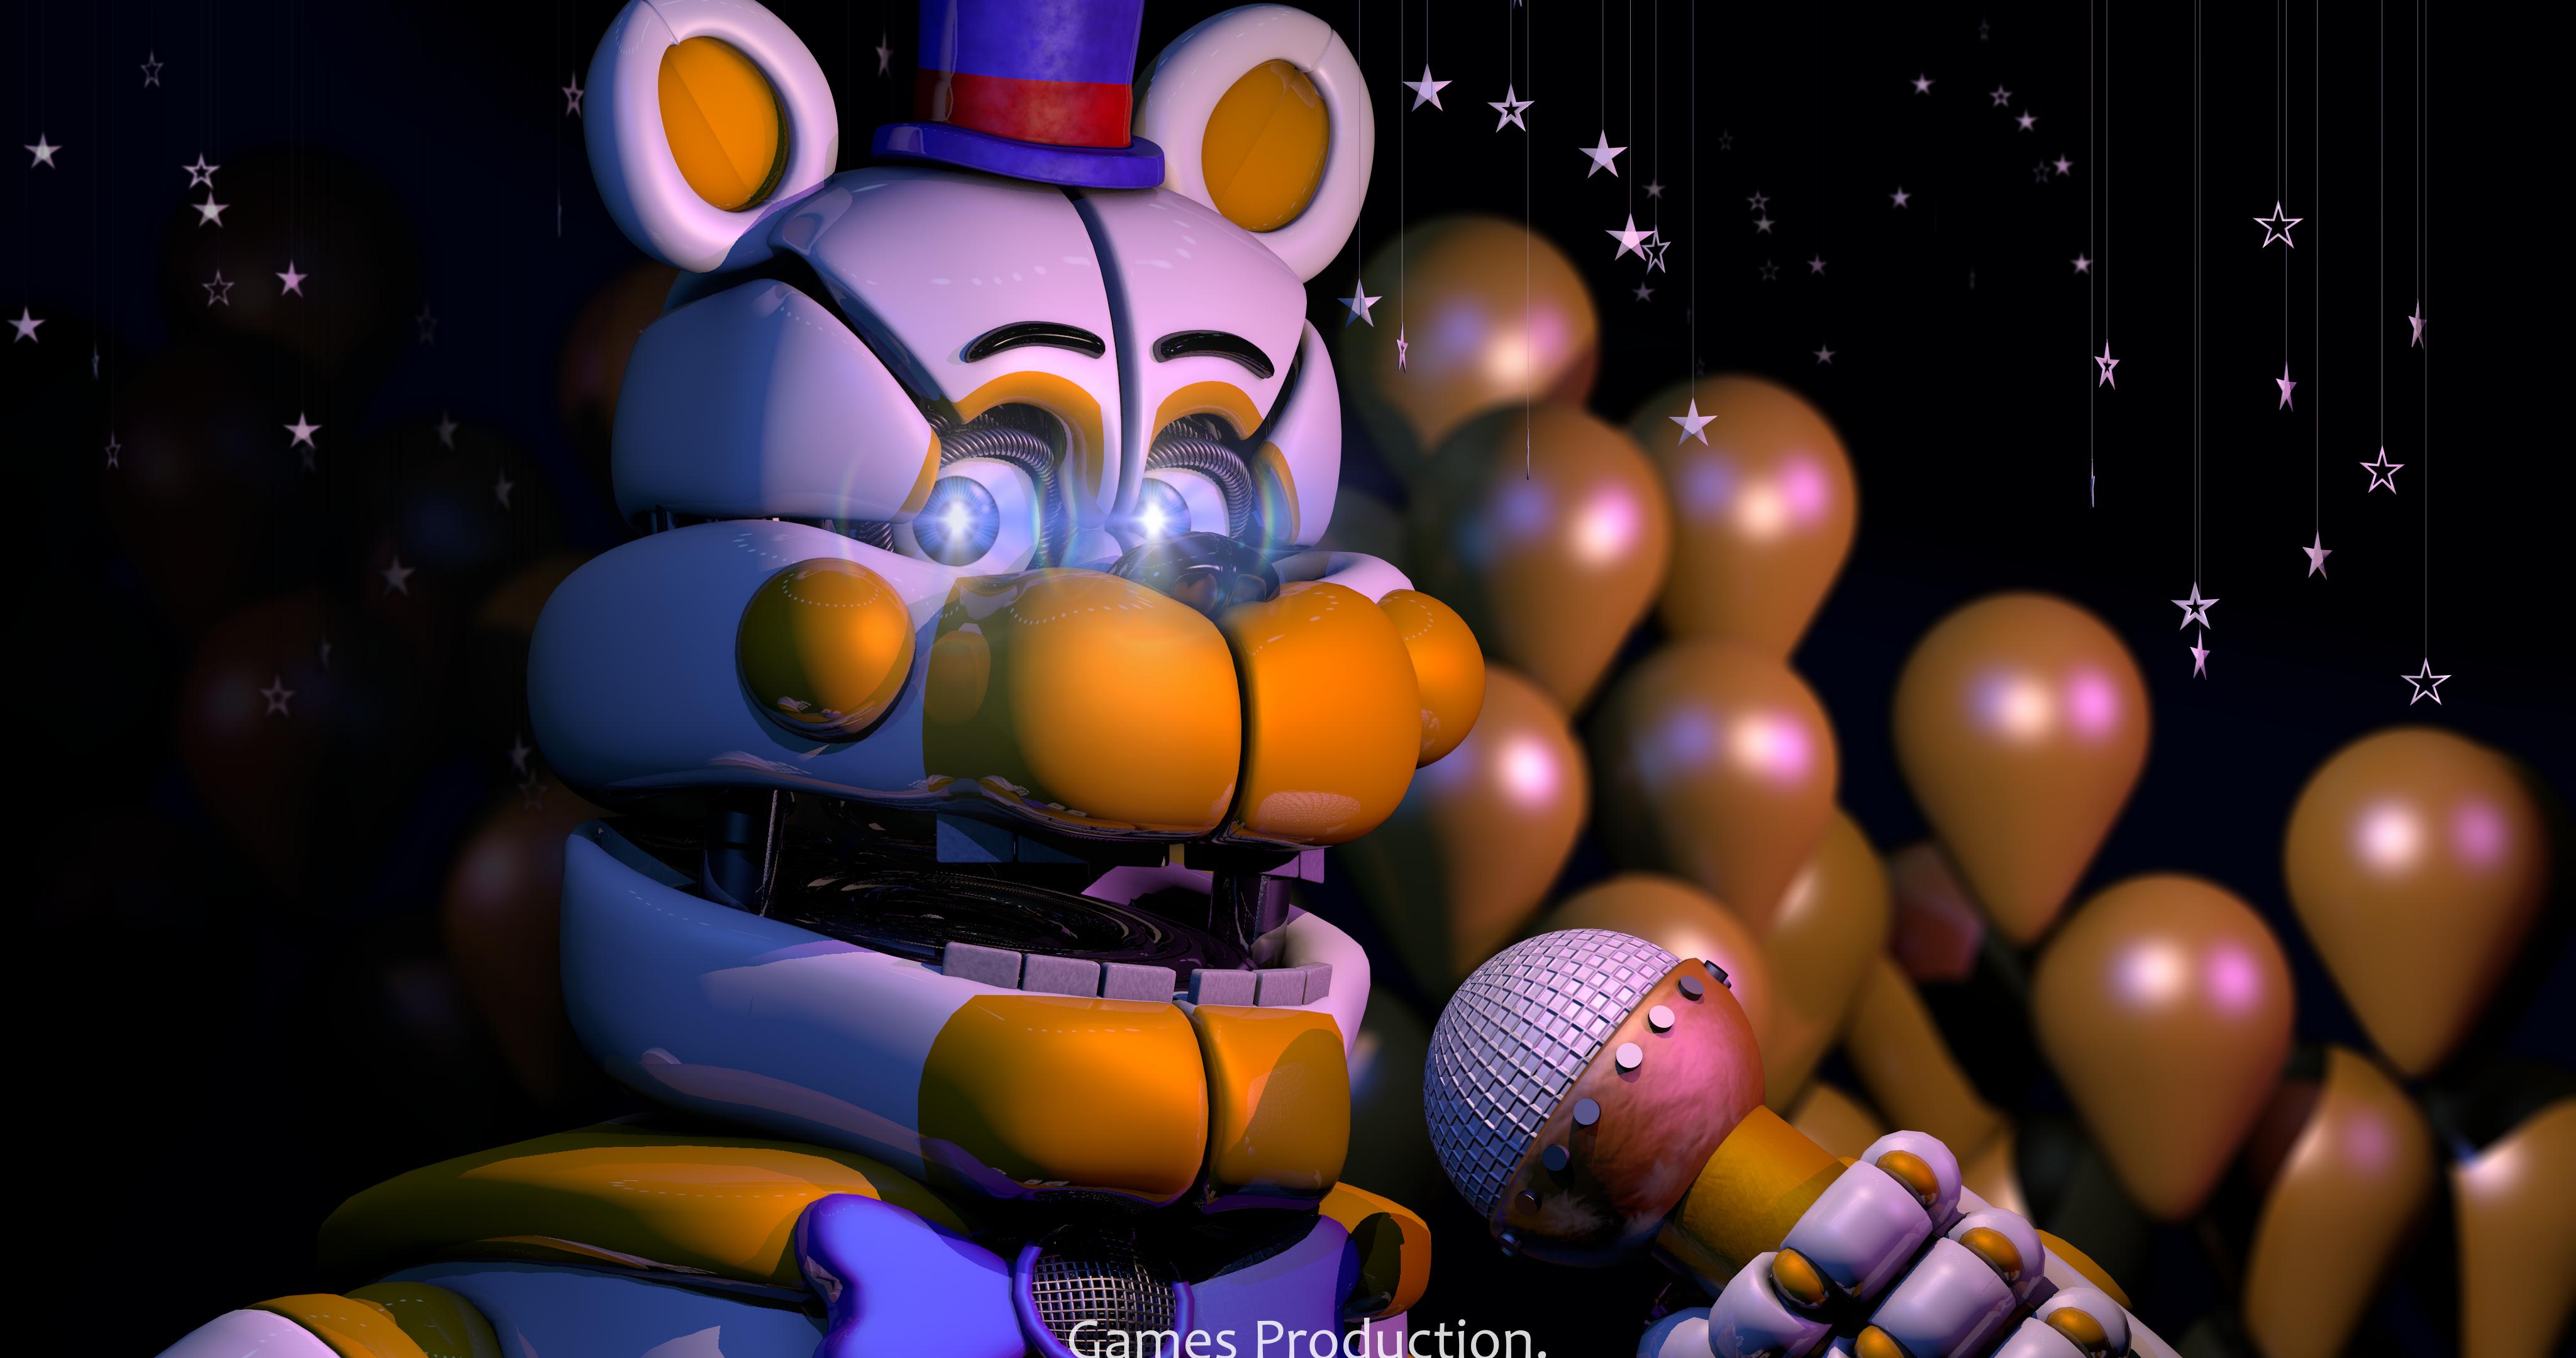 Funtime Fredbear V 2 4k By Gamesproduction On Deviantart